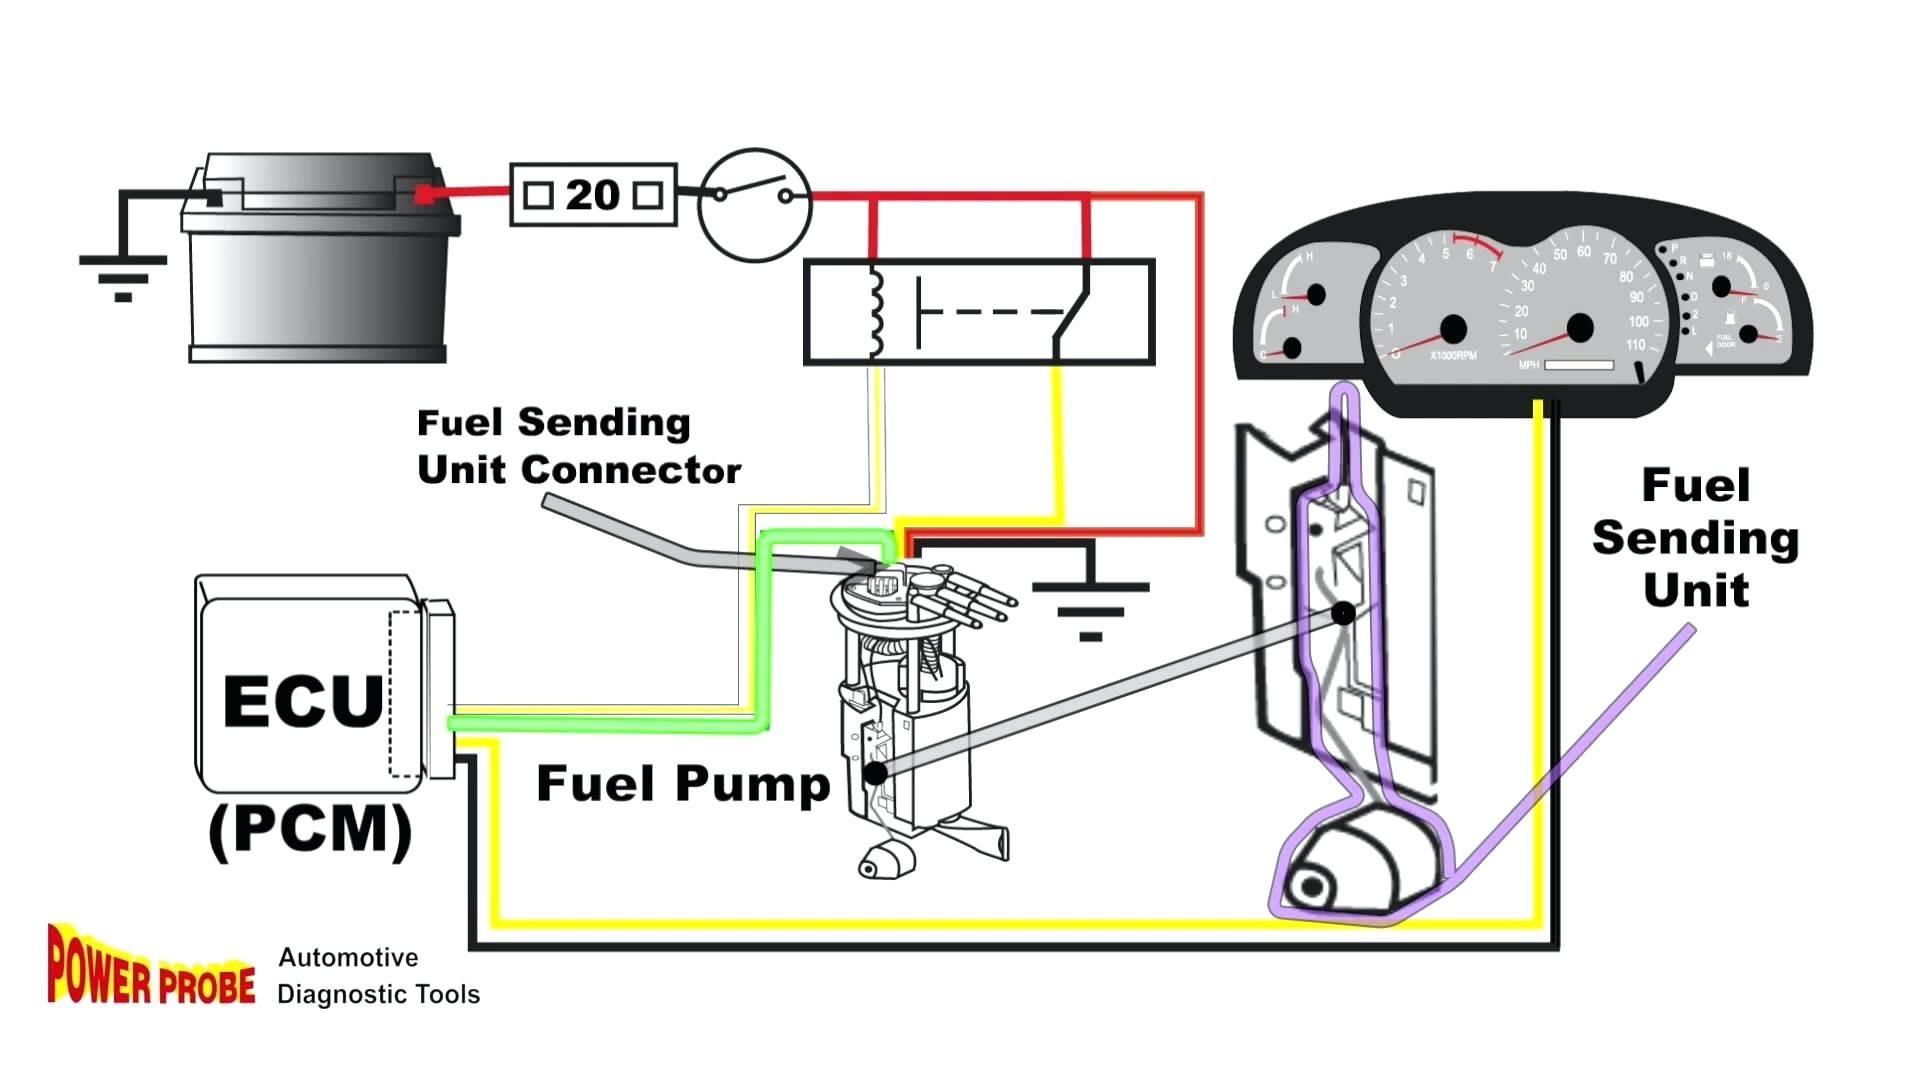 hight resolution of wiring diagram 3 way switch multiple lights marine fuel gauge stuning boat sending